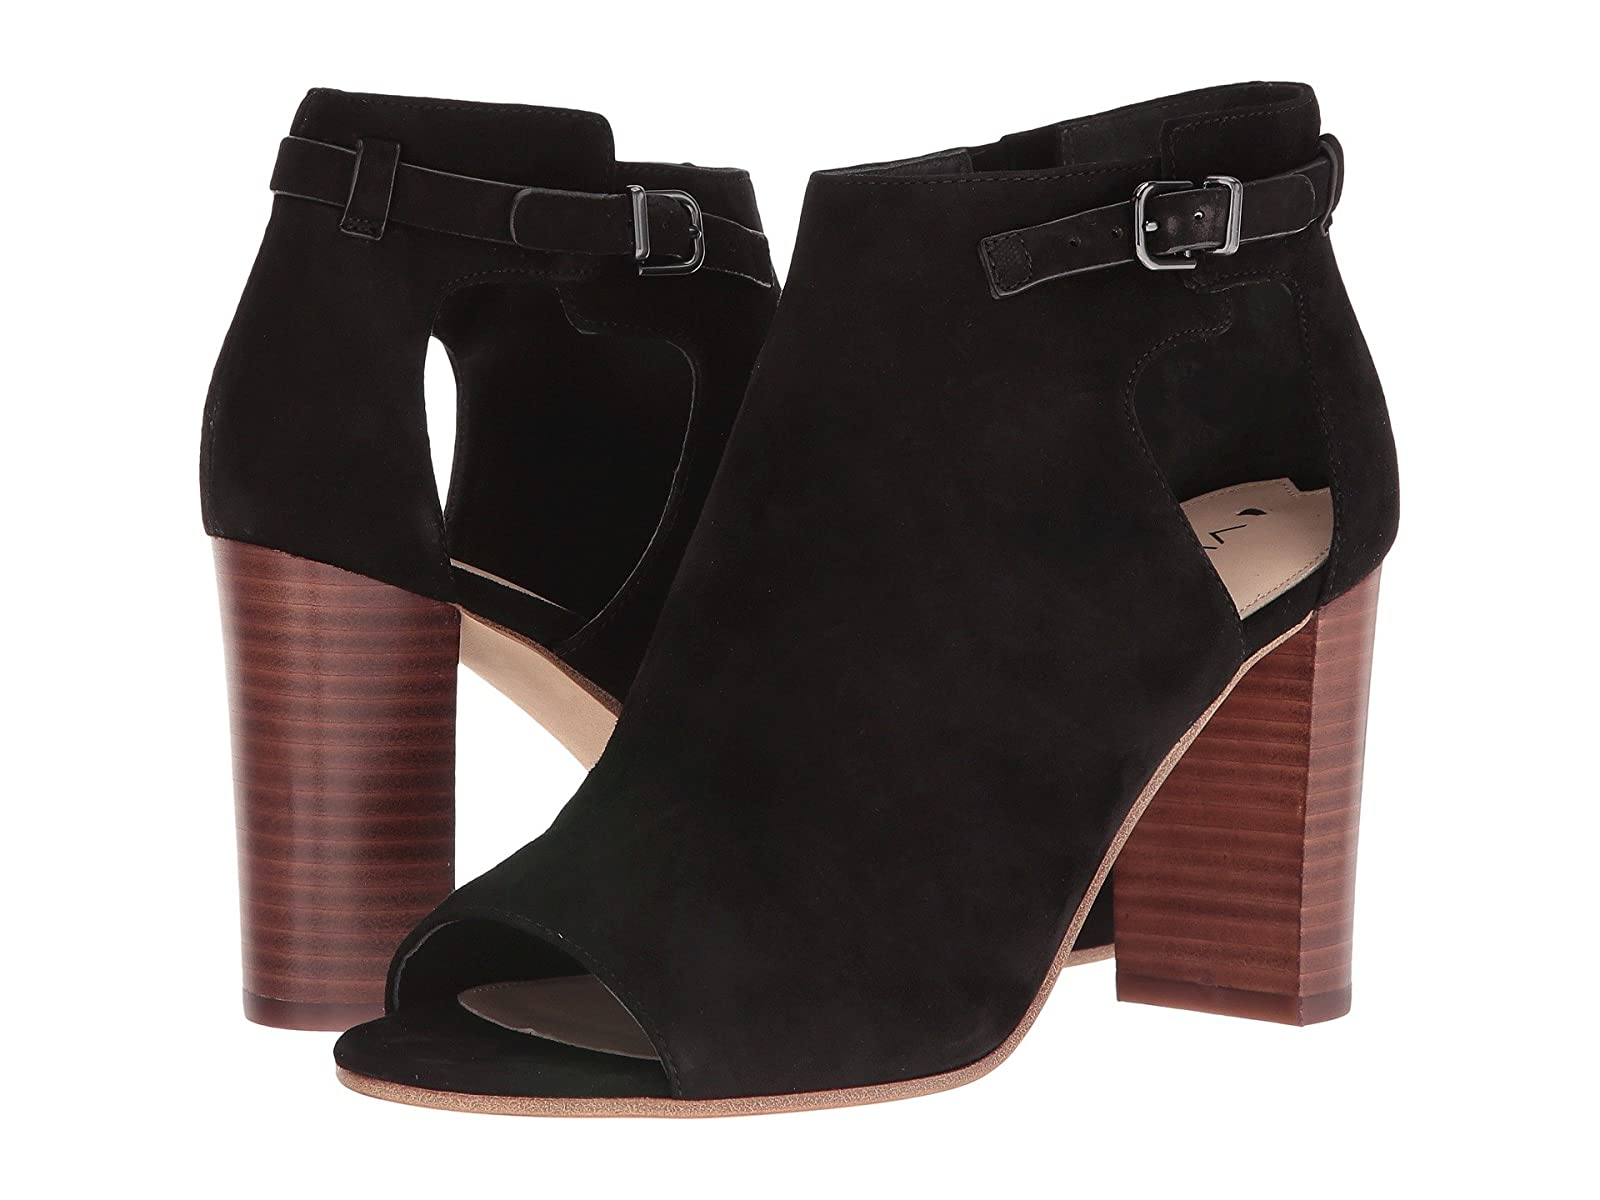 Via Spiga GiulianaCheap and distinctive eye-catching shoes